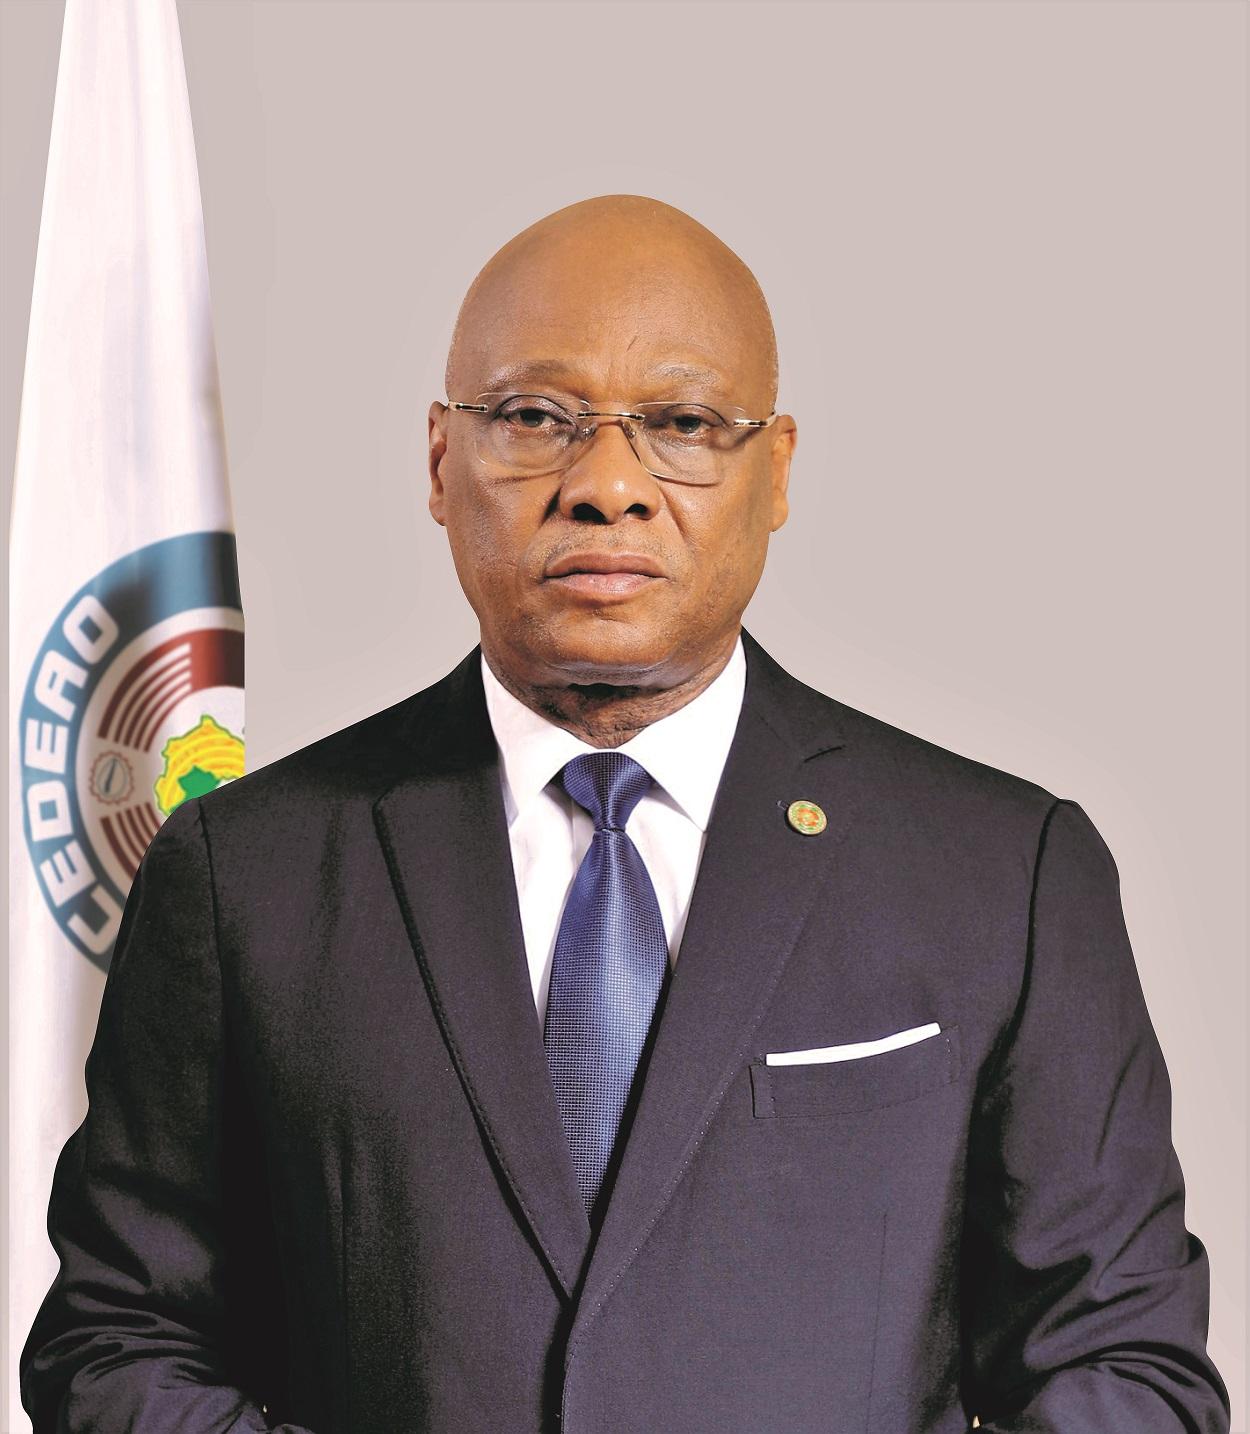 SEM-JEAN-CLAUDE-KASSI-BROU_ECOWAS-COMMISSION-PRESIDENT